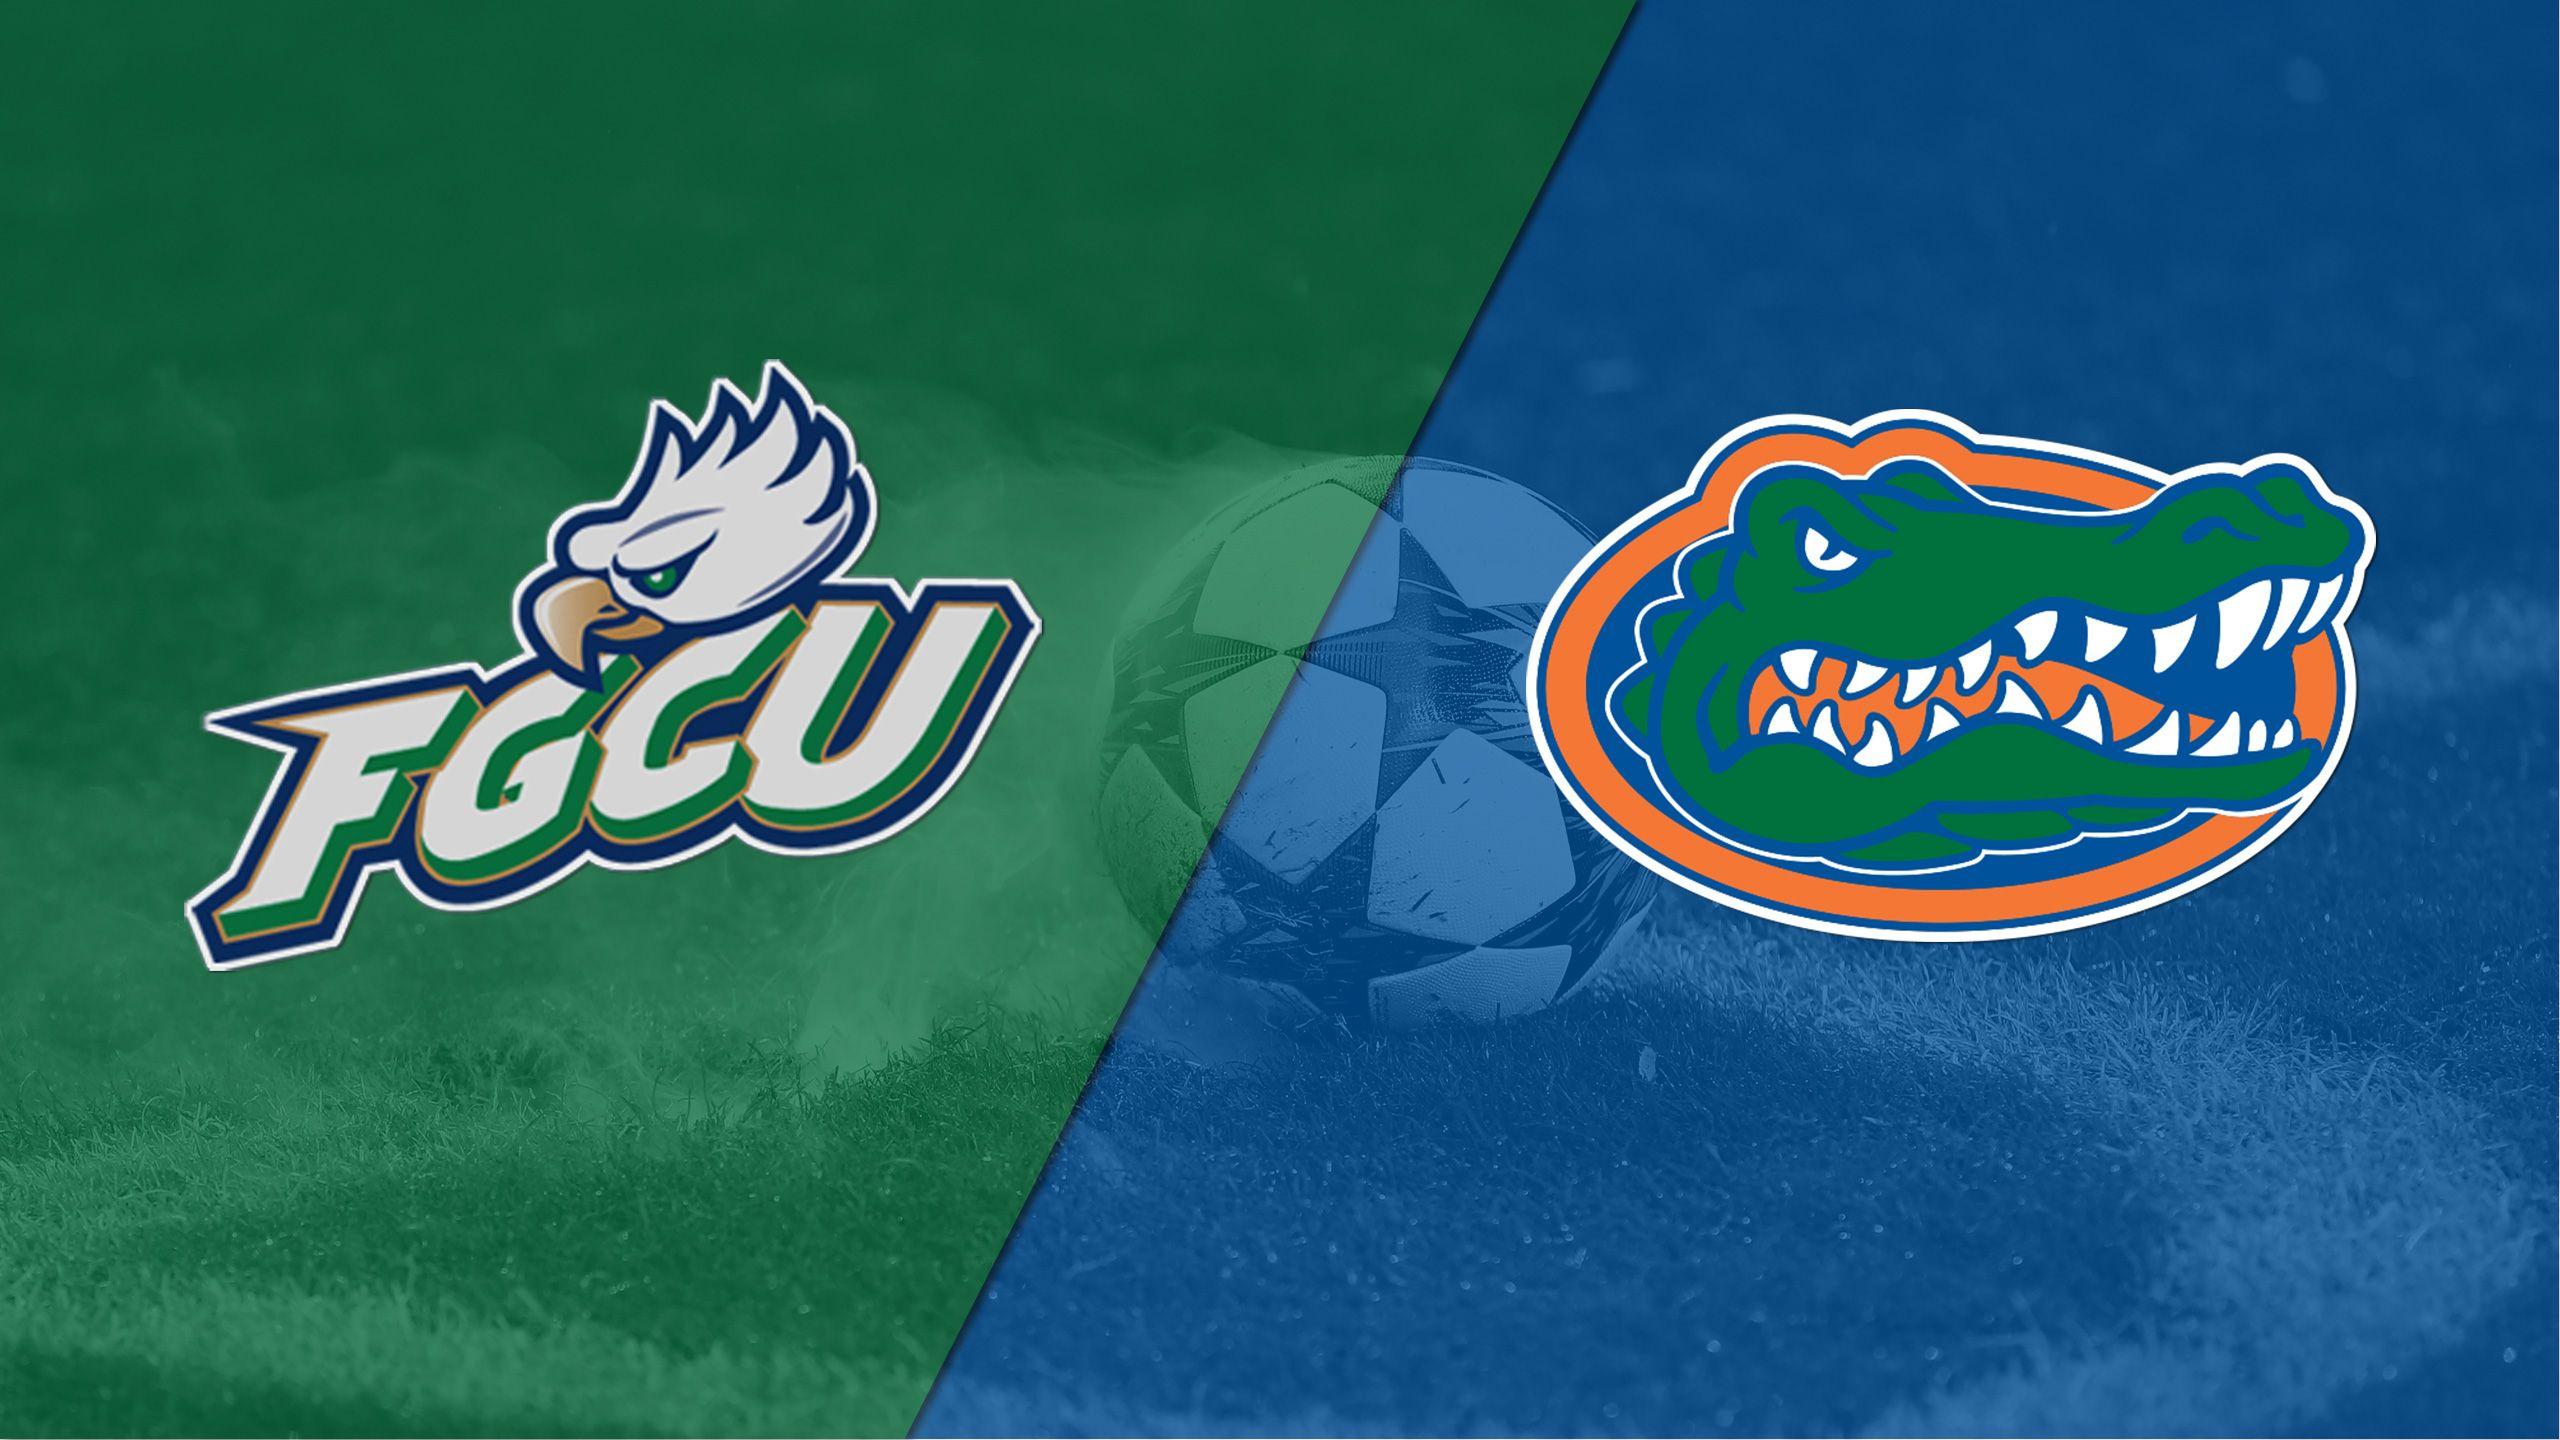 Florida Gulf Coast vs. Florida (First Round) (NCAA Women's Soccer Championship)